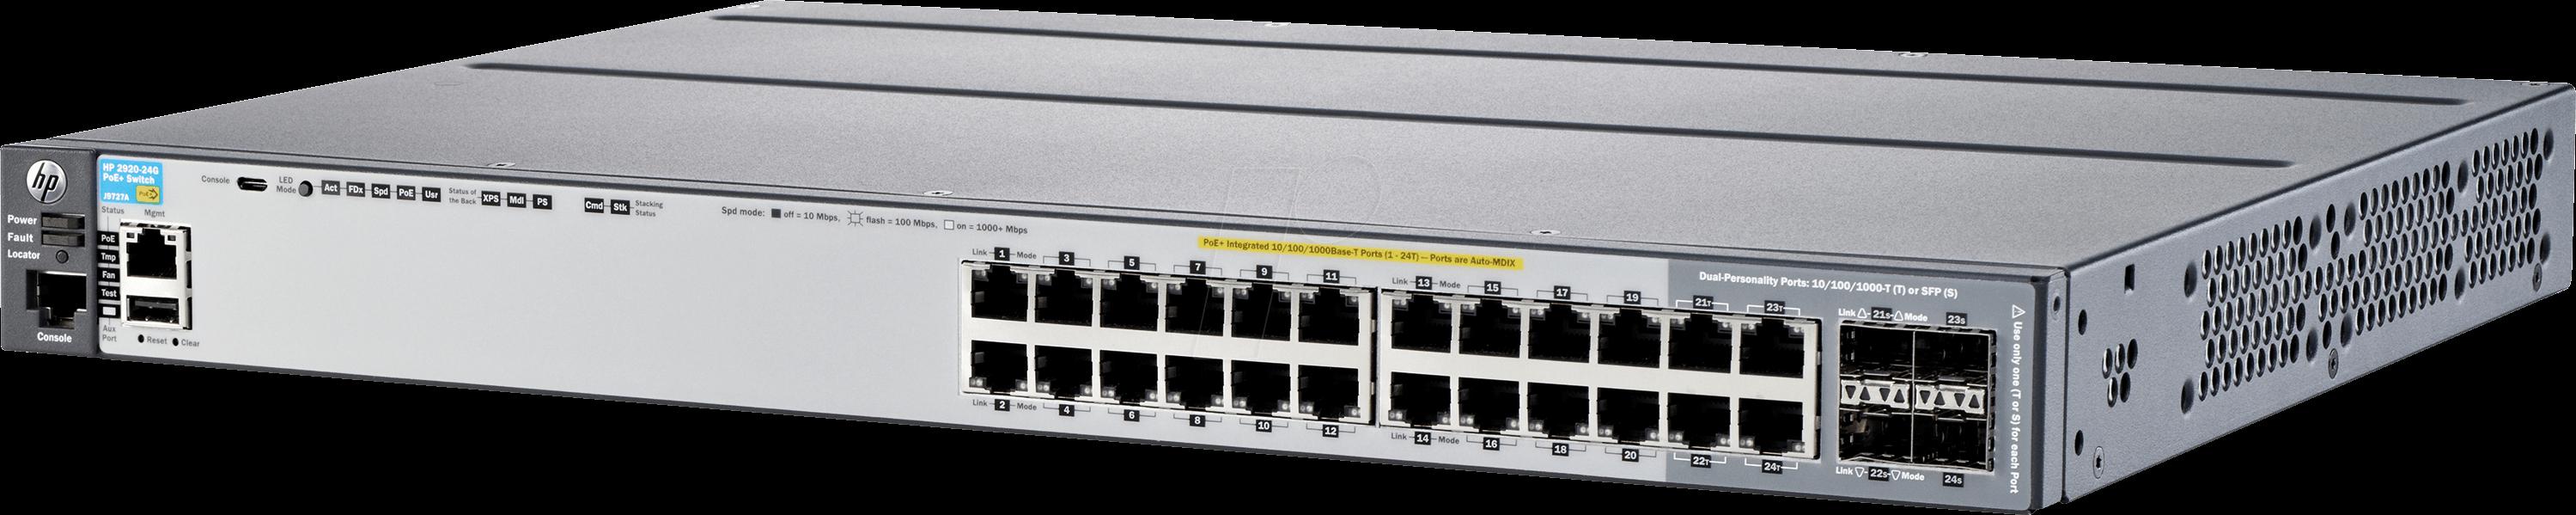 HP 2920-24G-POE+ - Switch, 24-Port, Gigabit Ethernet, PoE